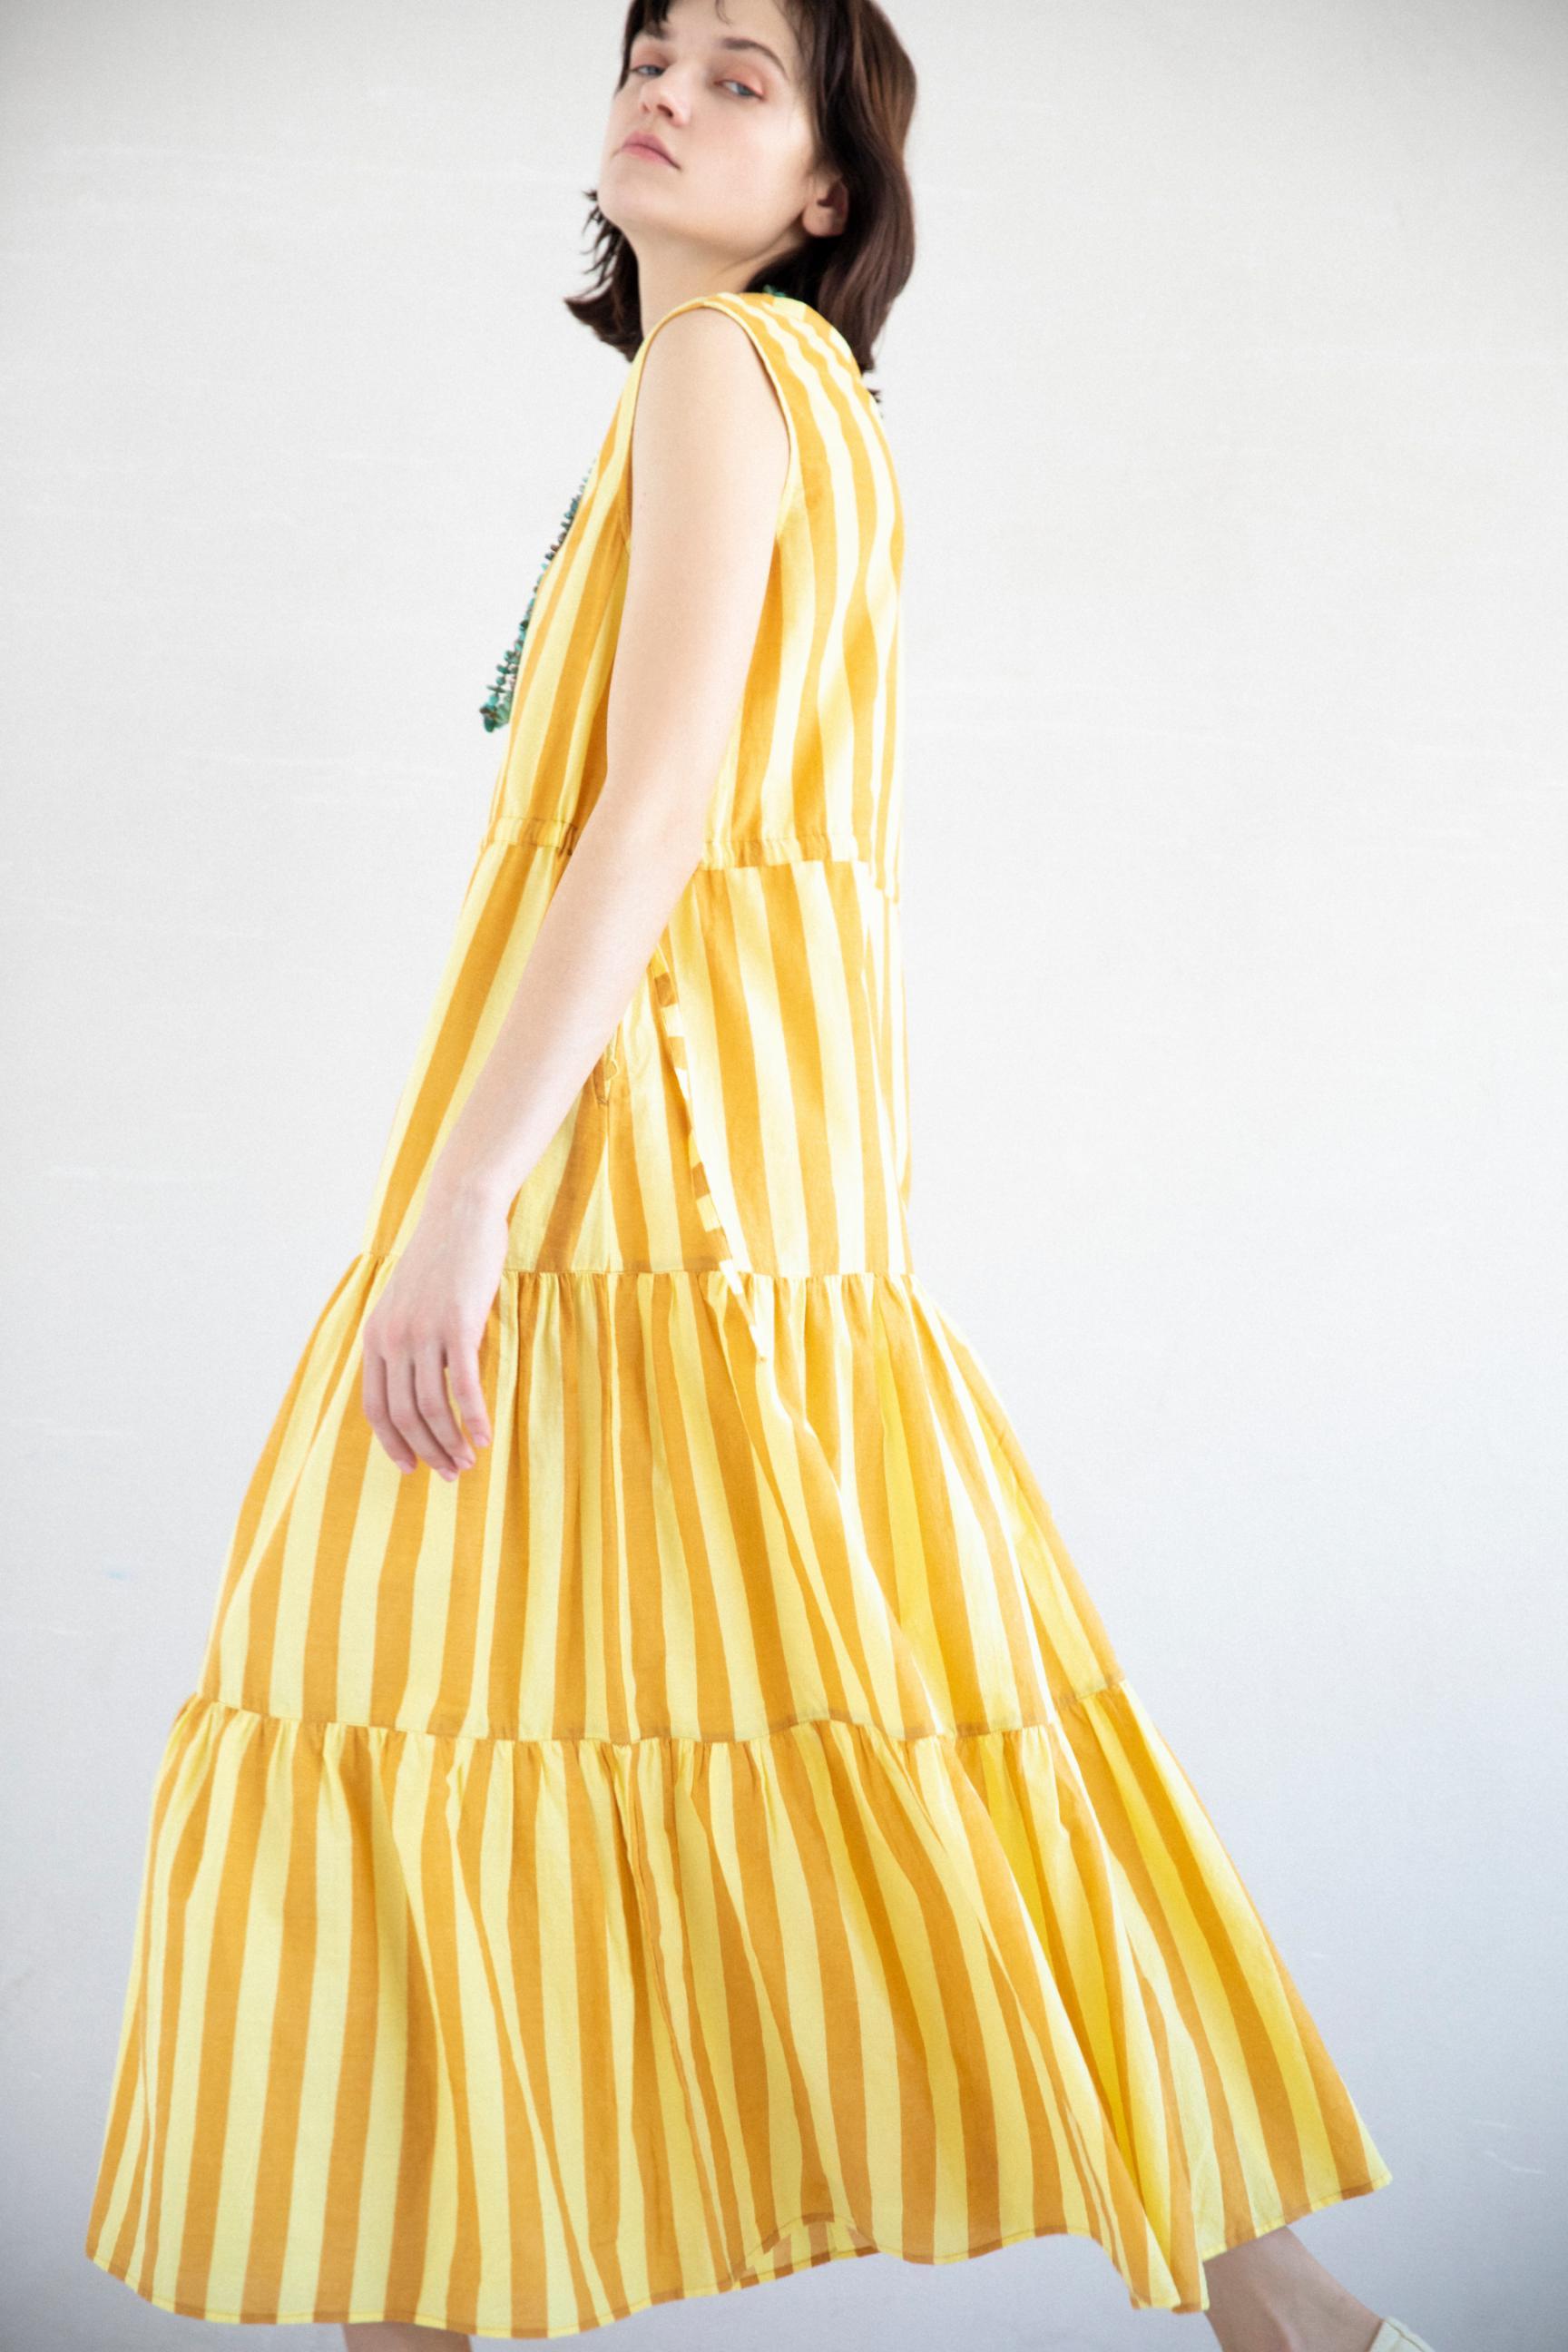 30_2 dress¥23,100 necklace¥45,100